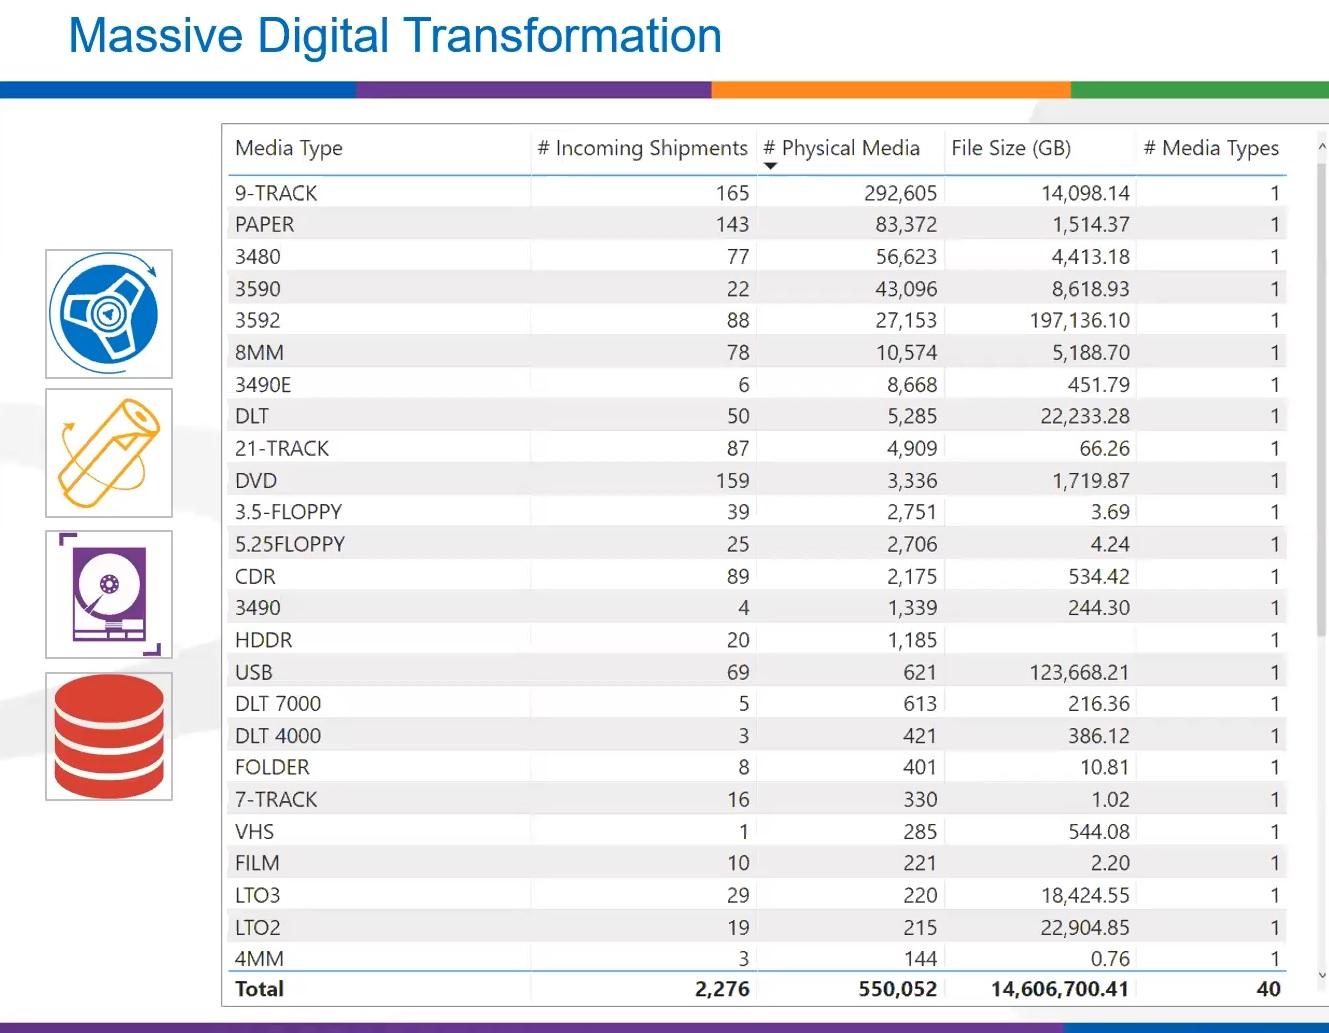 Digital transformation media types for subsurface data